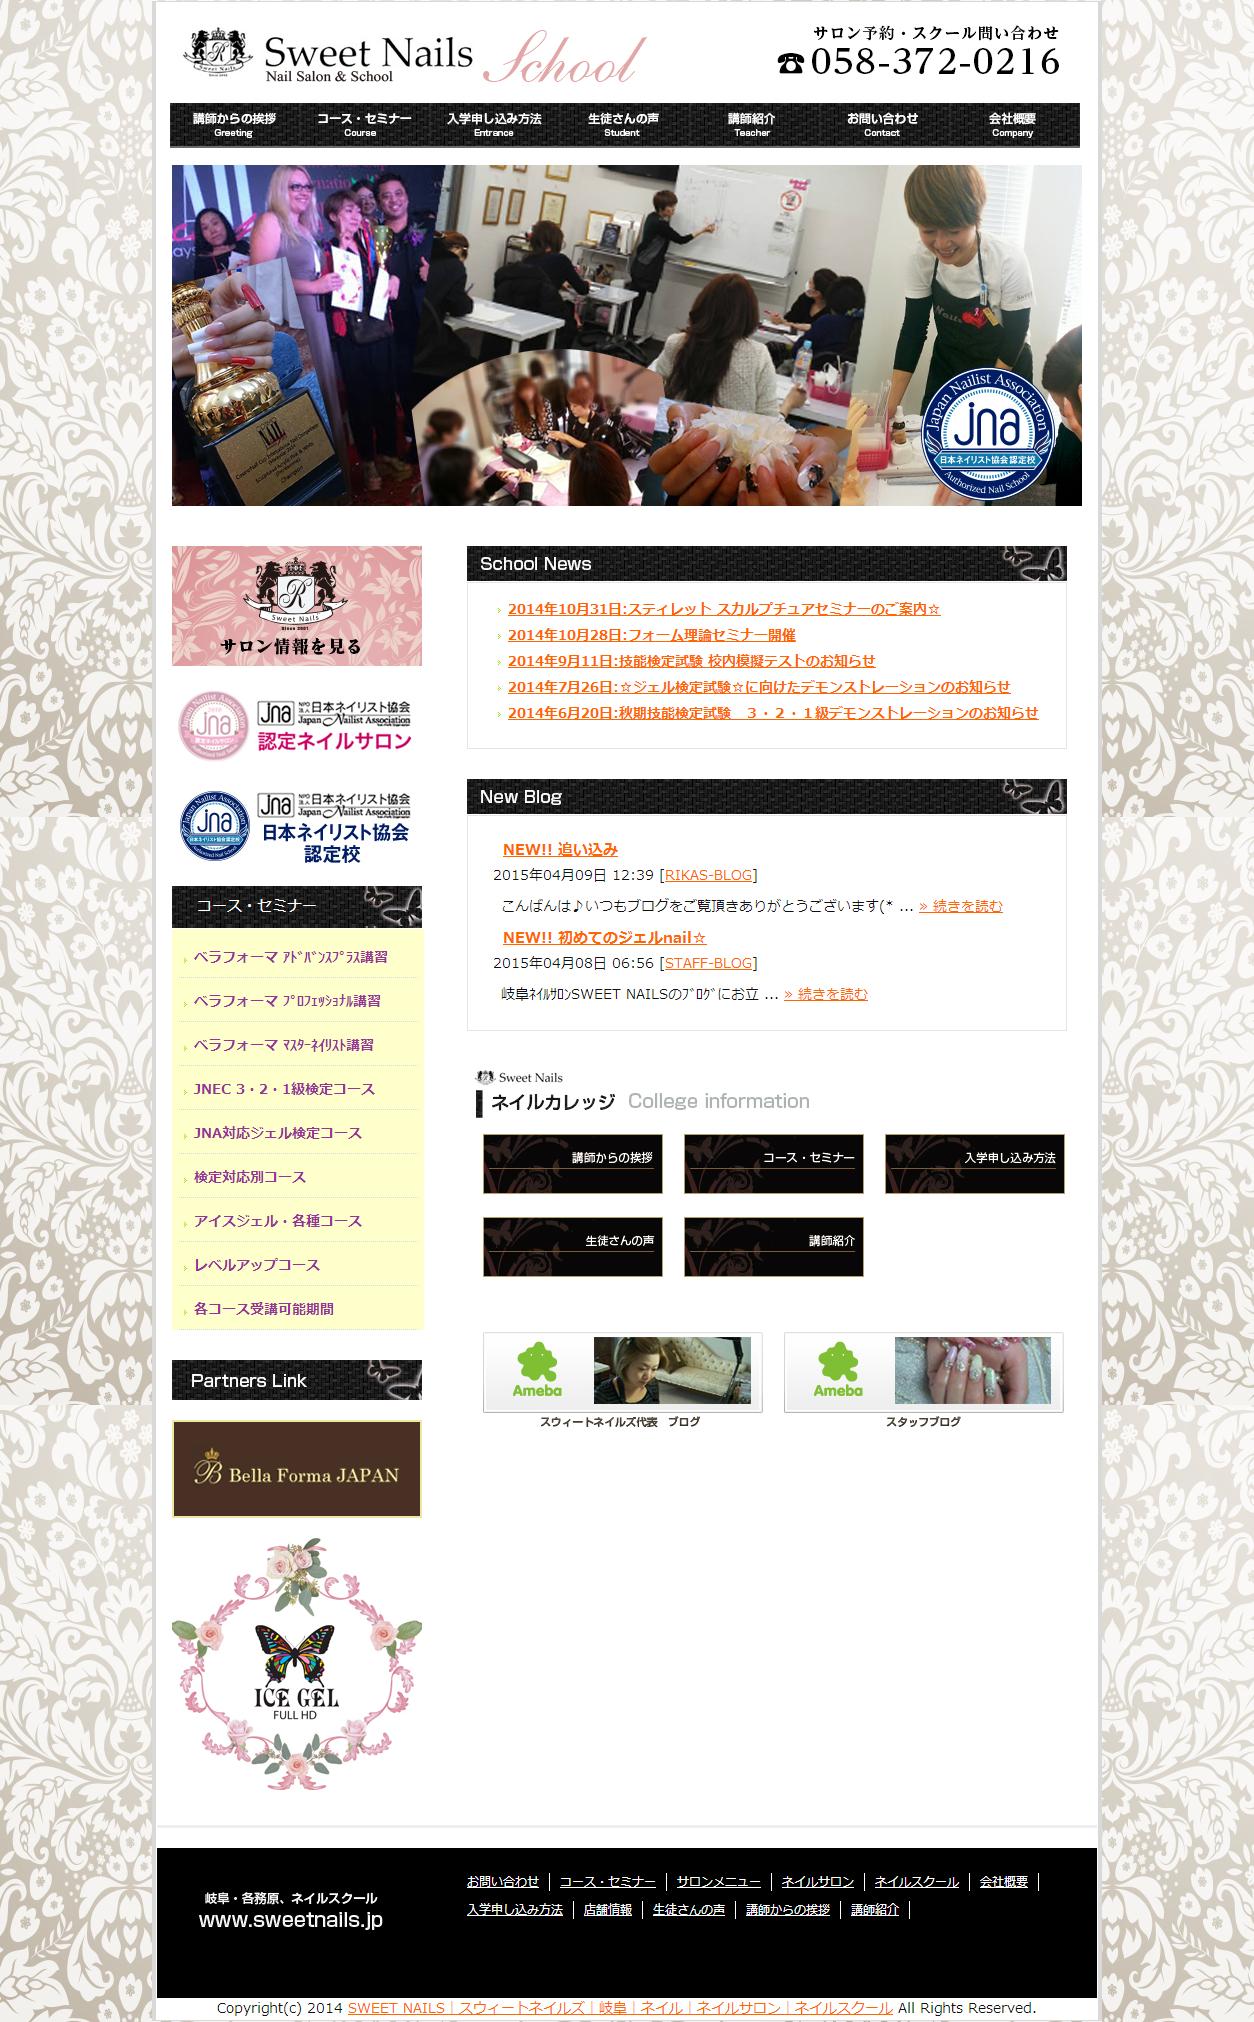 screencapture sweetnails jp school 1428647126298 - ネイルサロン・スクール様のホームページの制作を担当しました。